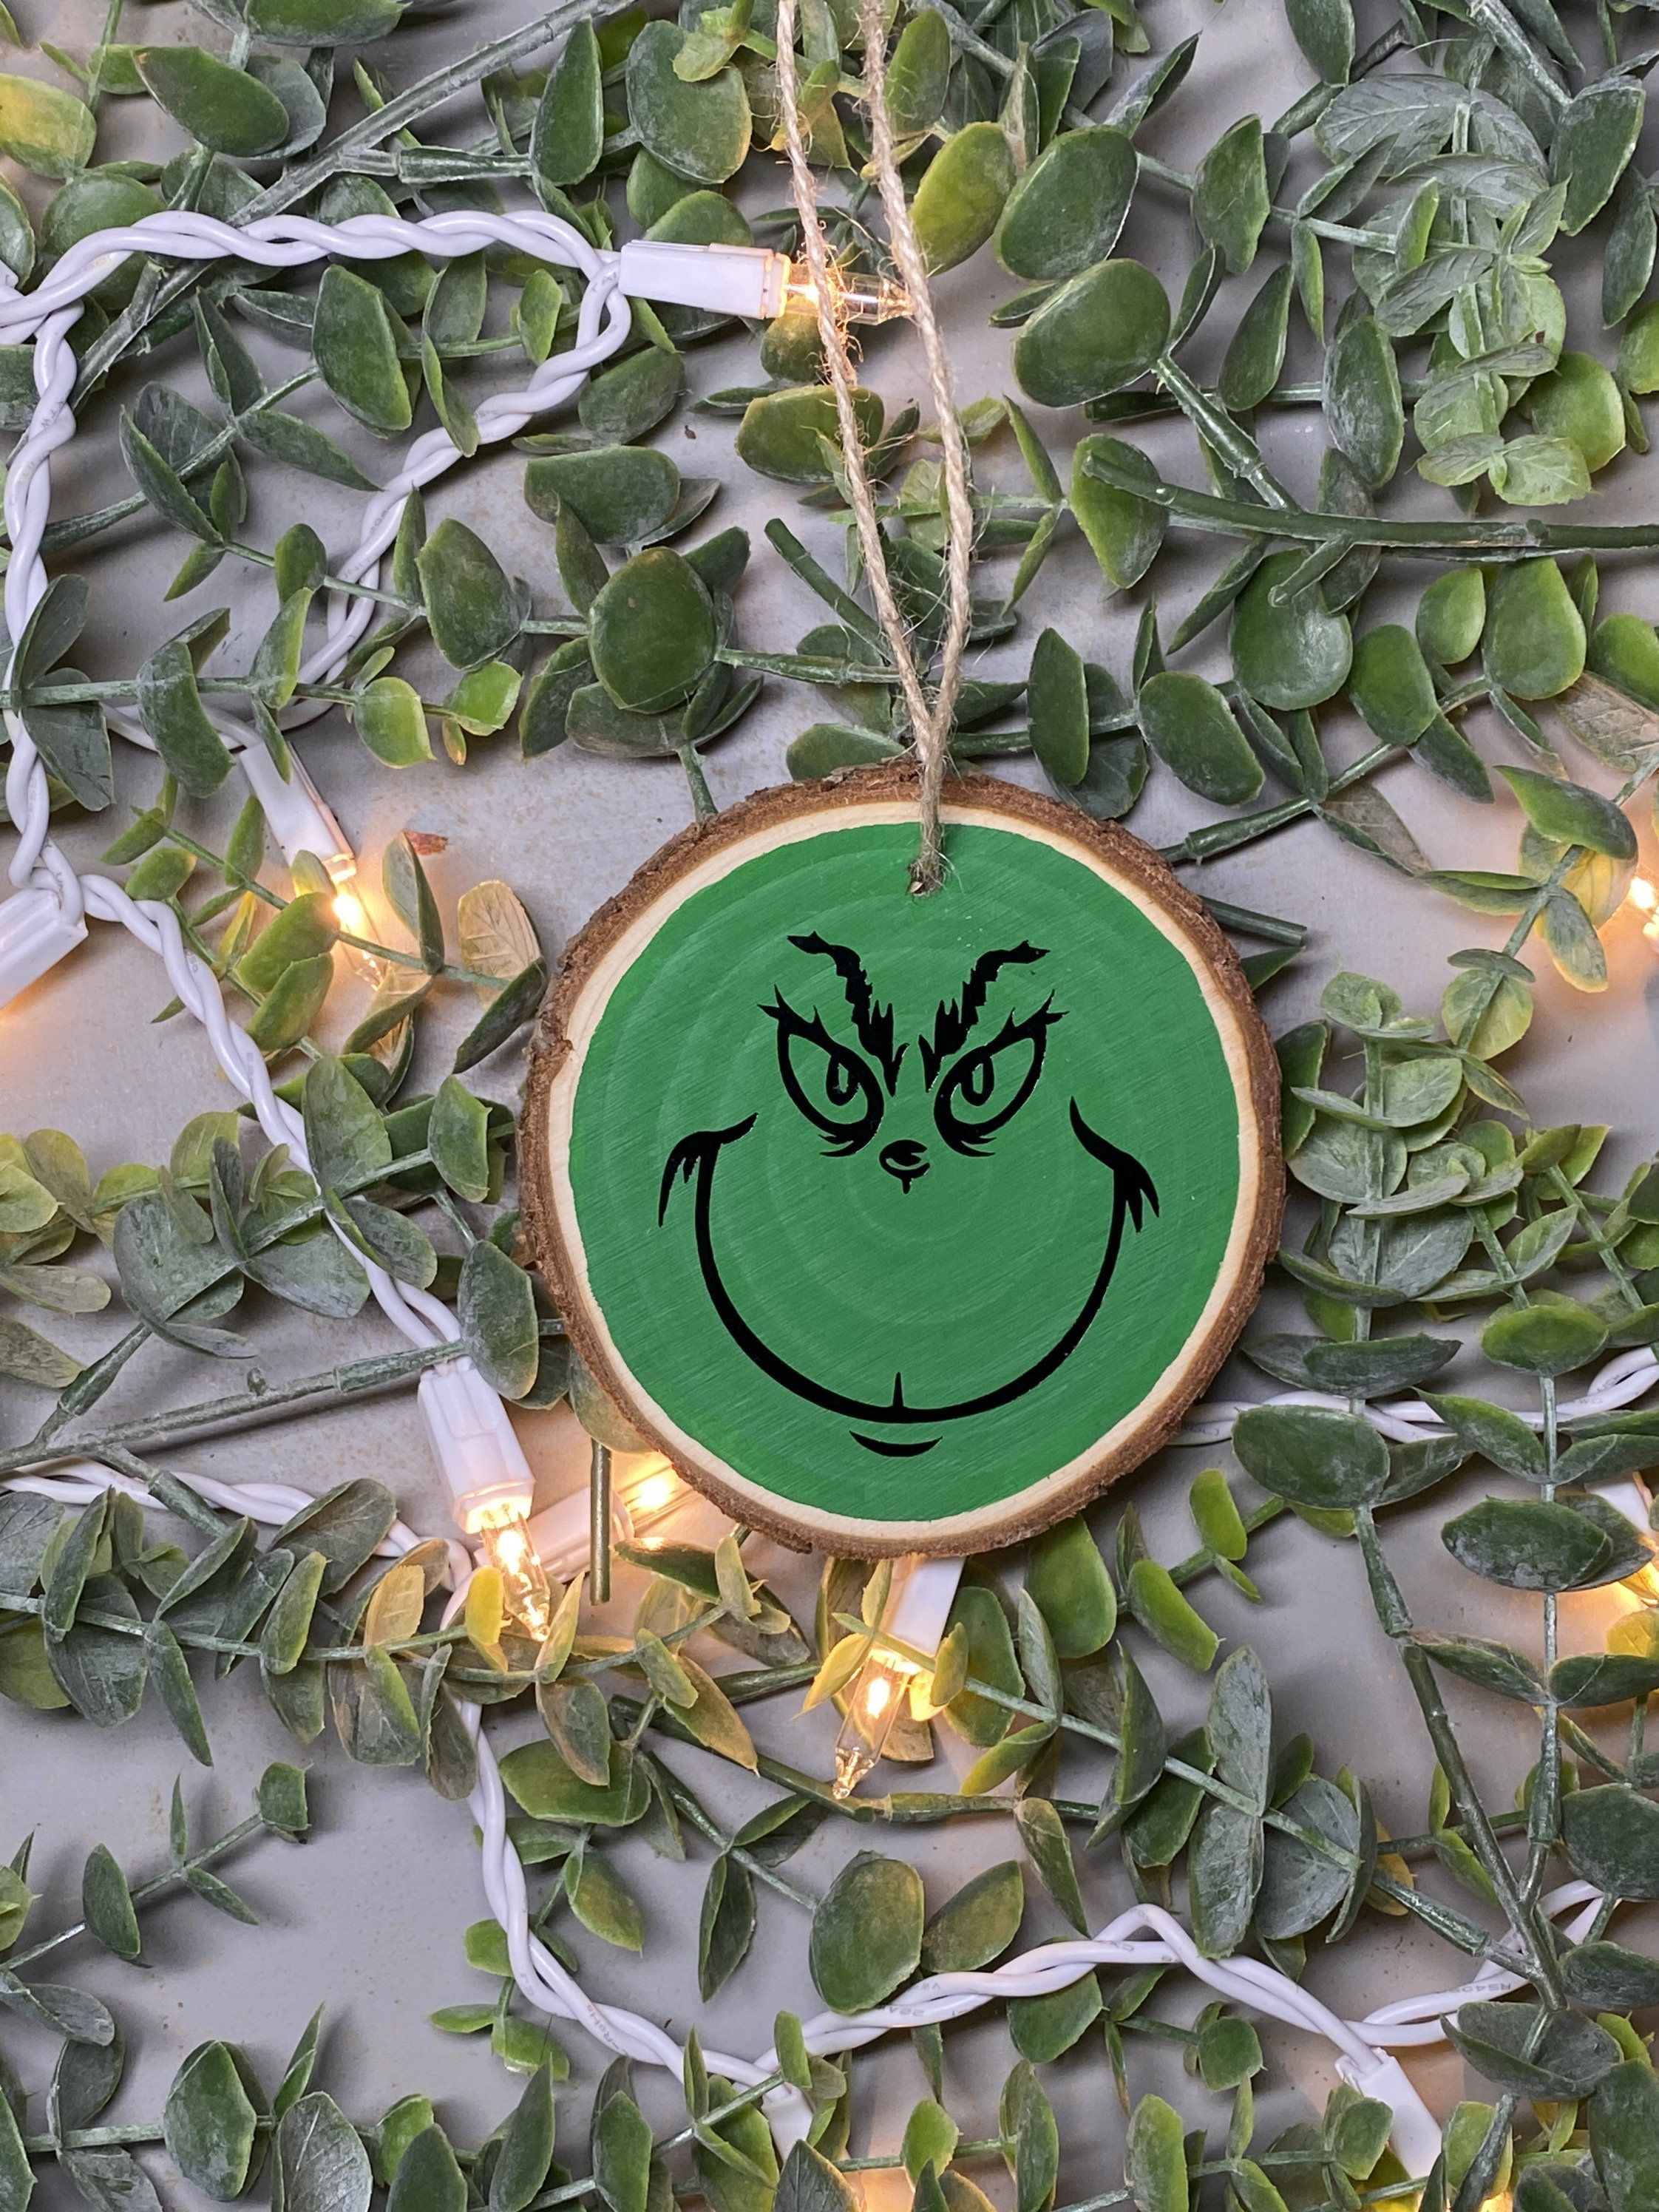 Grinch Wooden Ornament Wood Slice Ornament Grinch Farm Etsy Wood Christmas Ornaments Wooden Christmas Ornaments Wooden Ornaments Diy